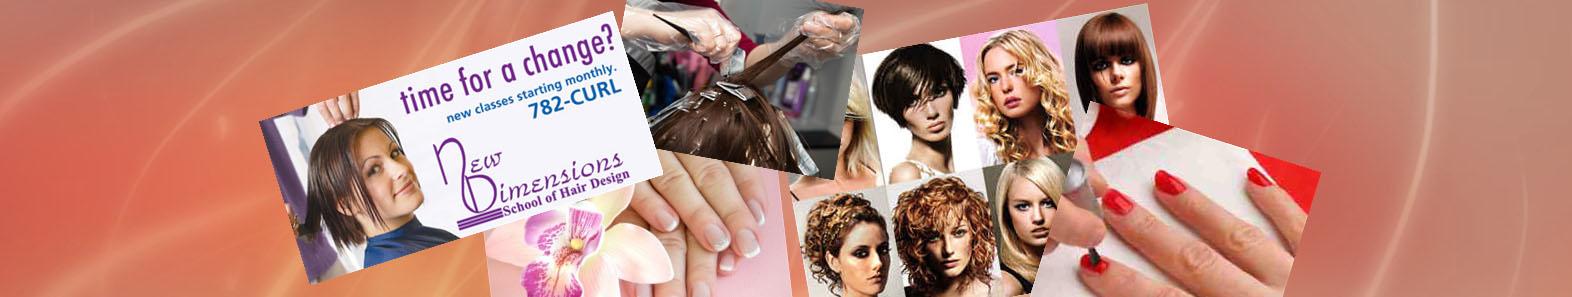 New Dimensions School of Hair Design